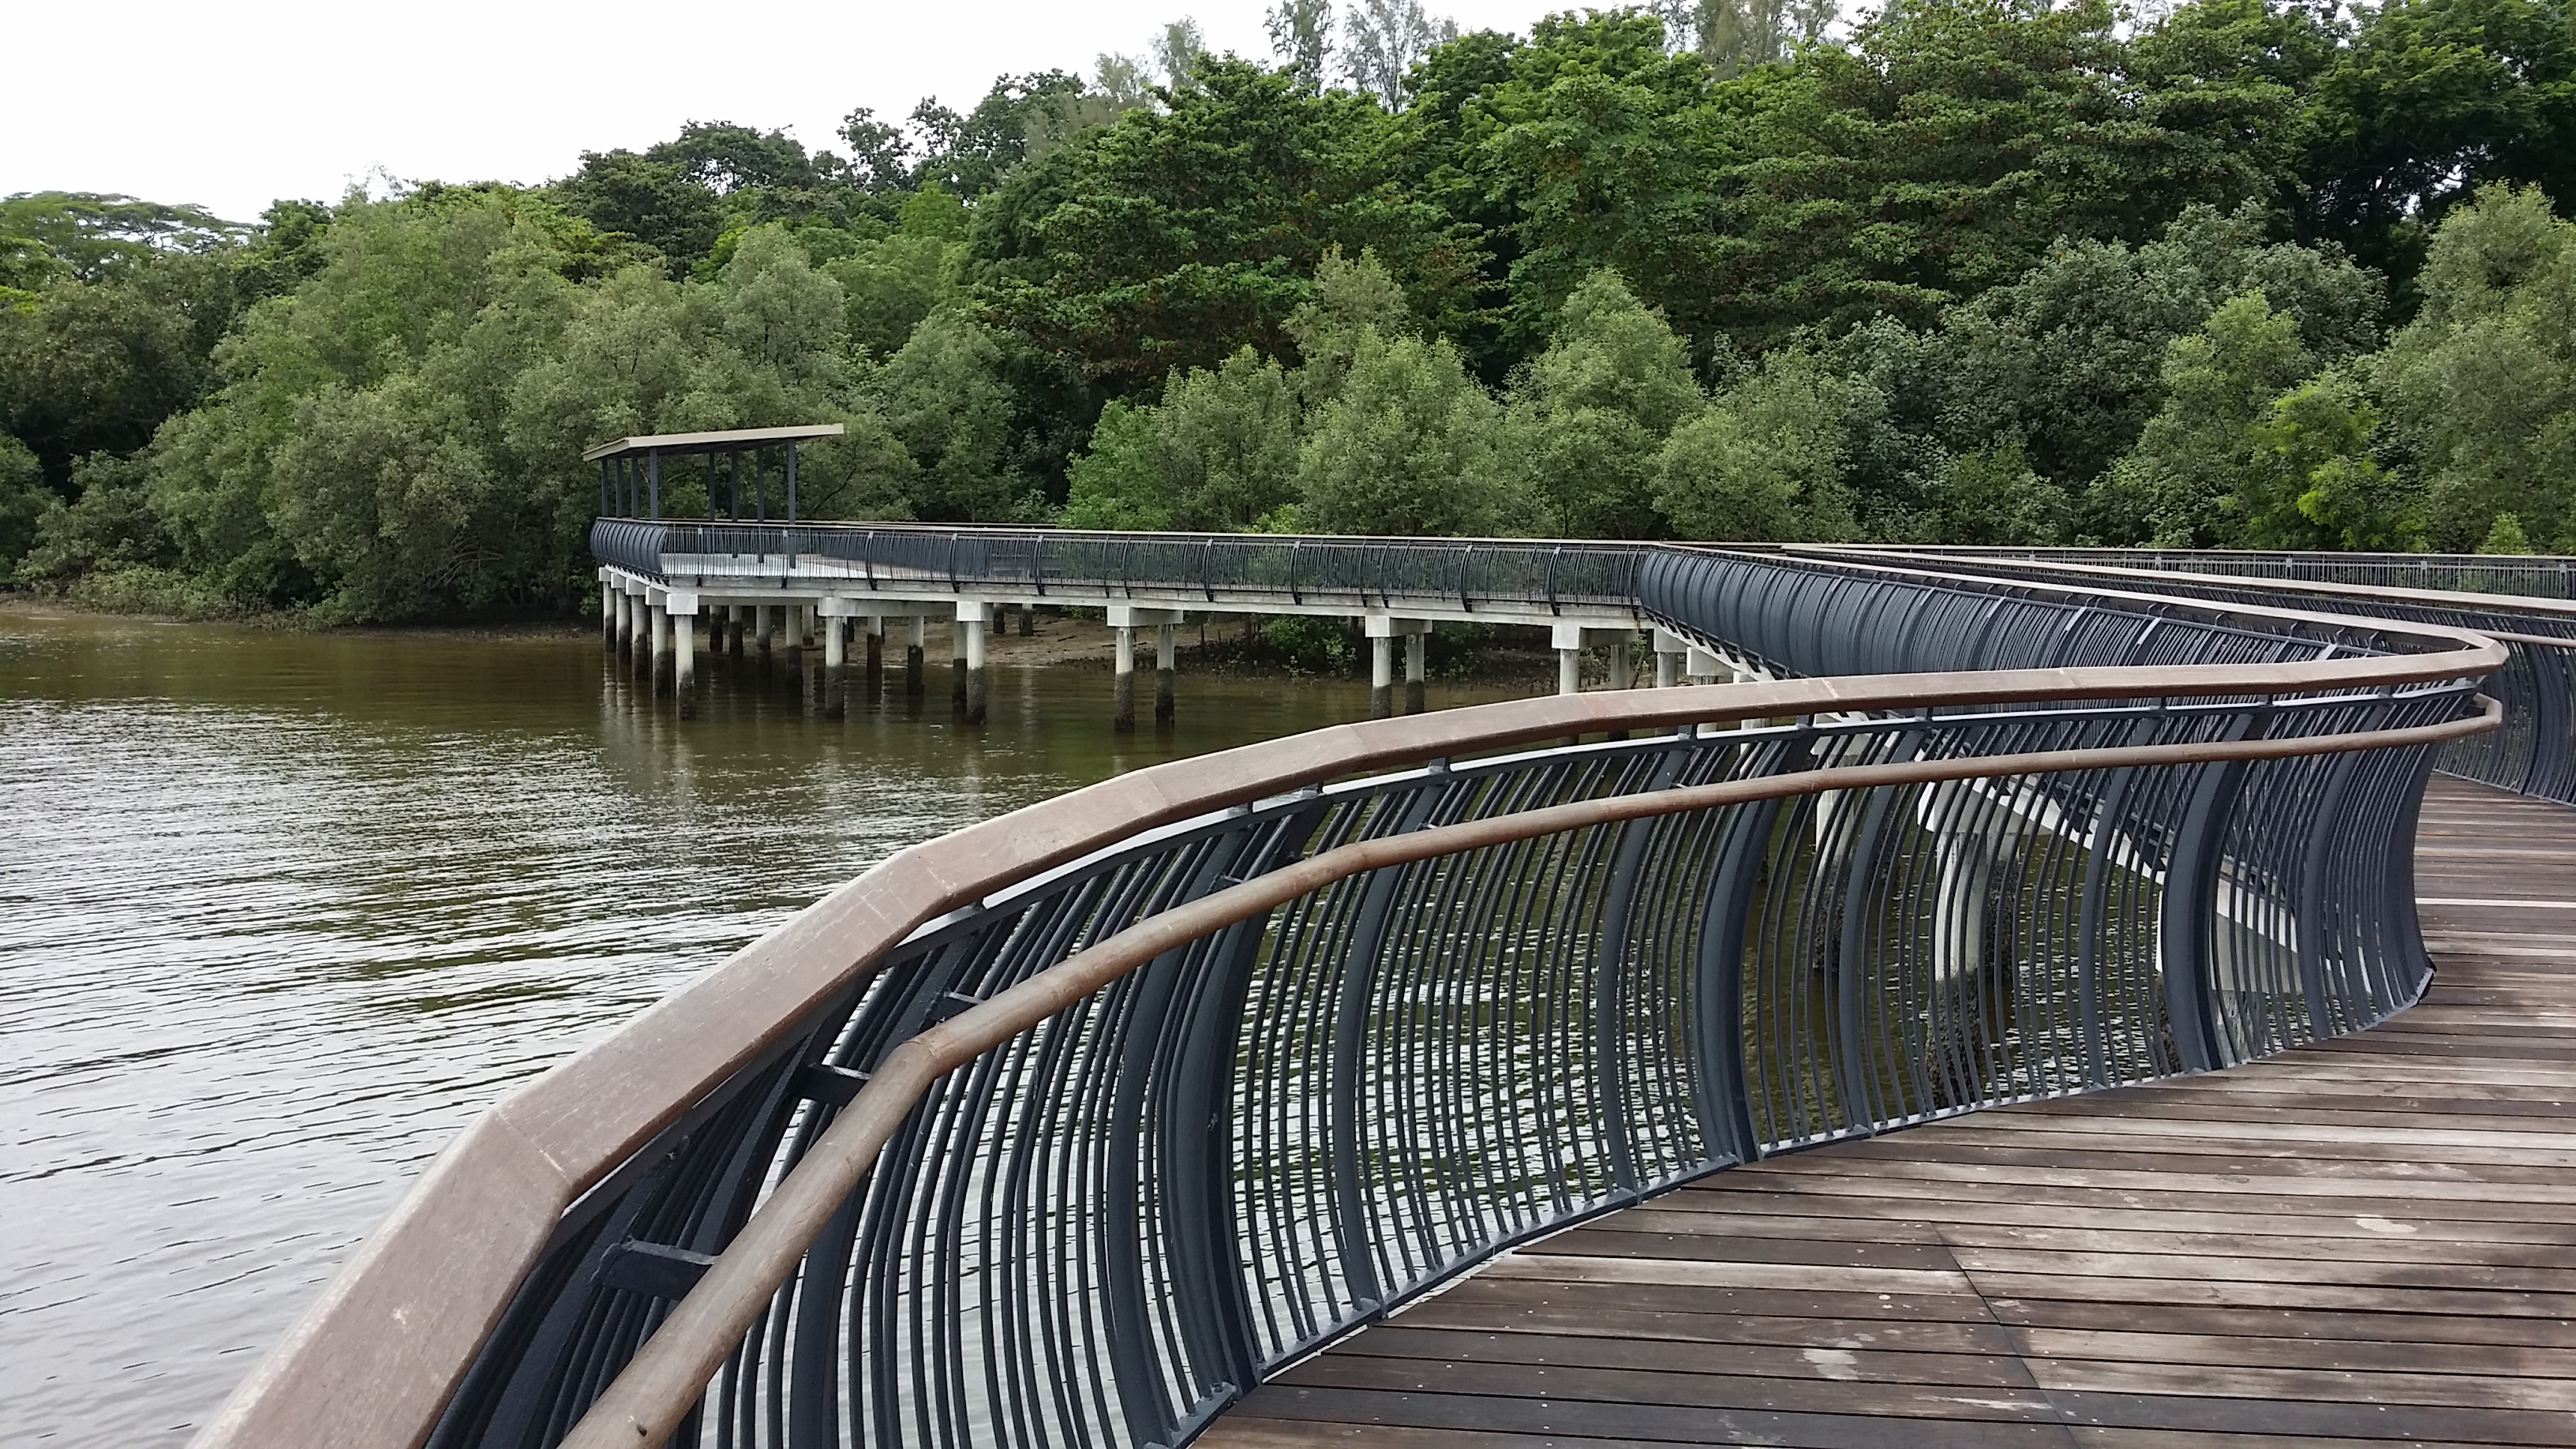 Sungei Buloh Wetland Reserve - Parks & Nature Reserves - Gardens, Parks &  Nature - National Parks Board (NParks)